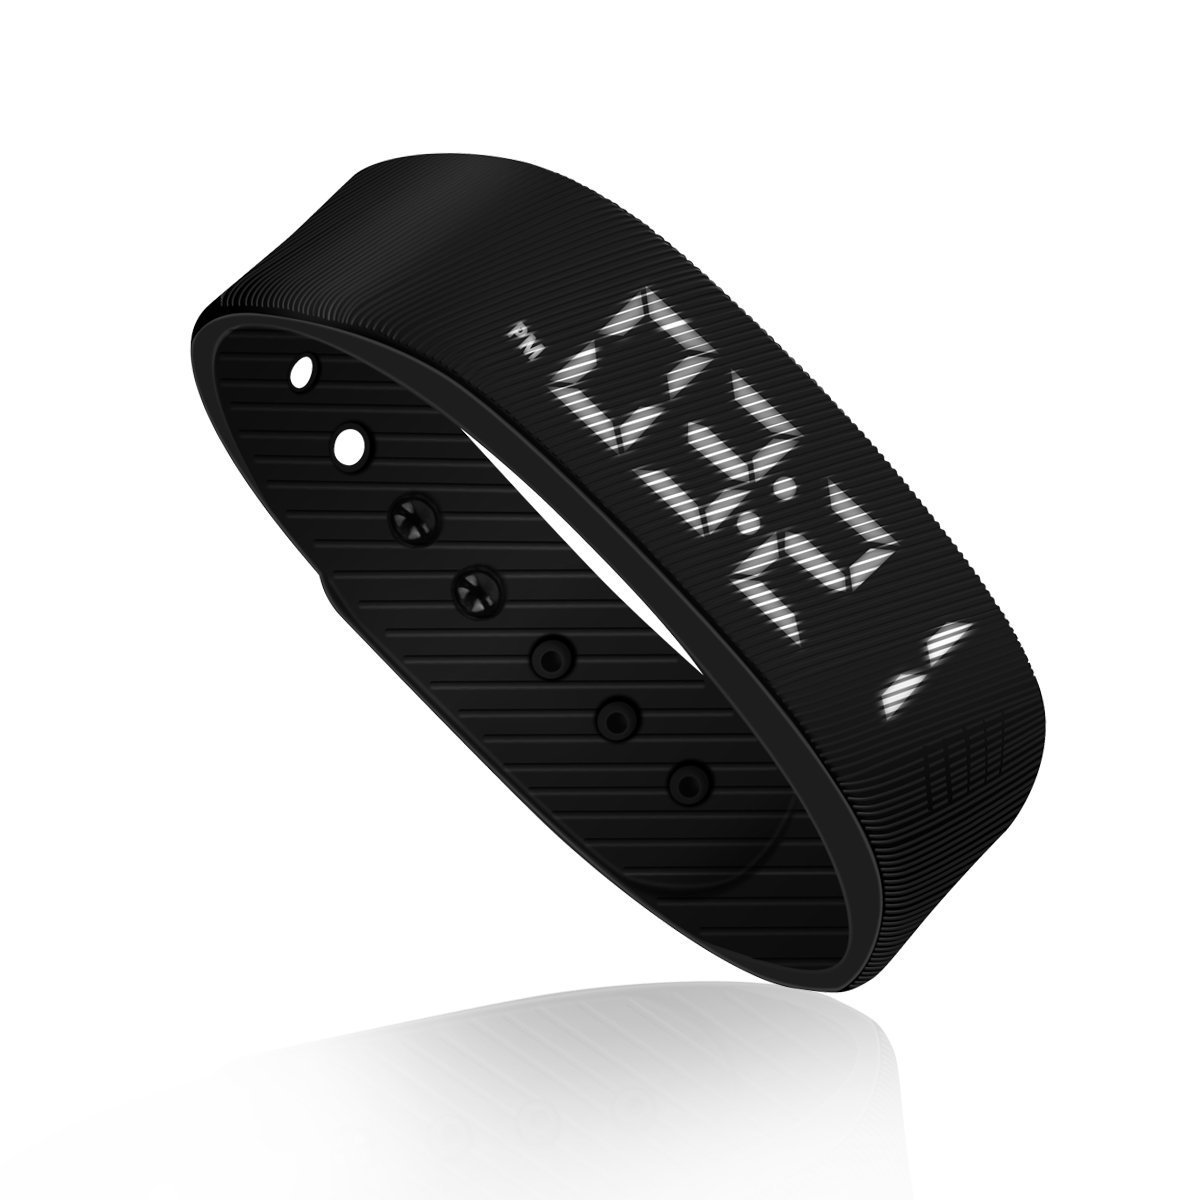 Schrittzähler Pedometer Einfach bedienung Fitness Armband Fitnessarmband